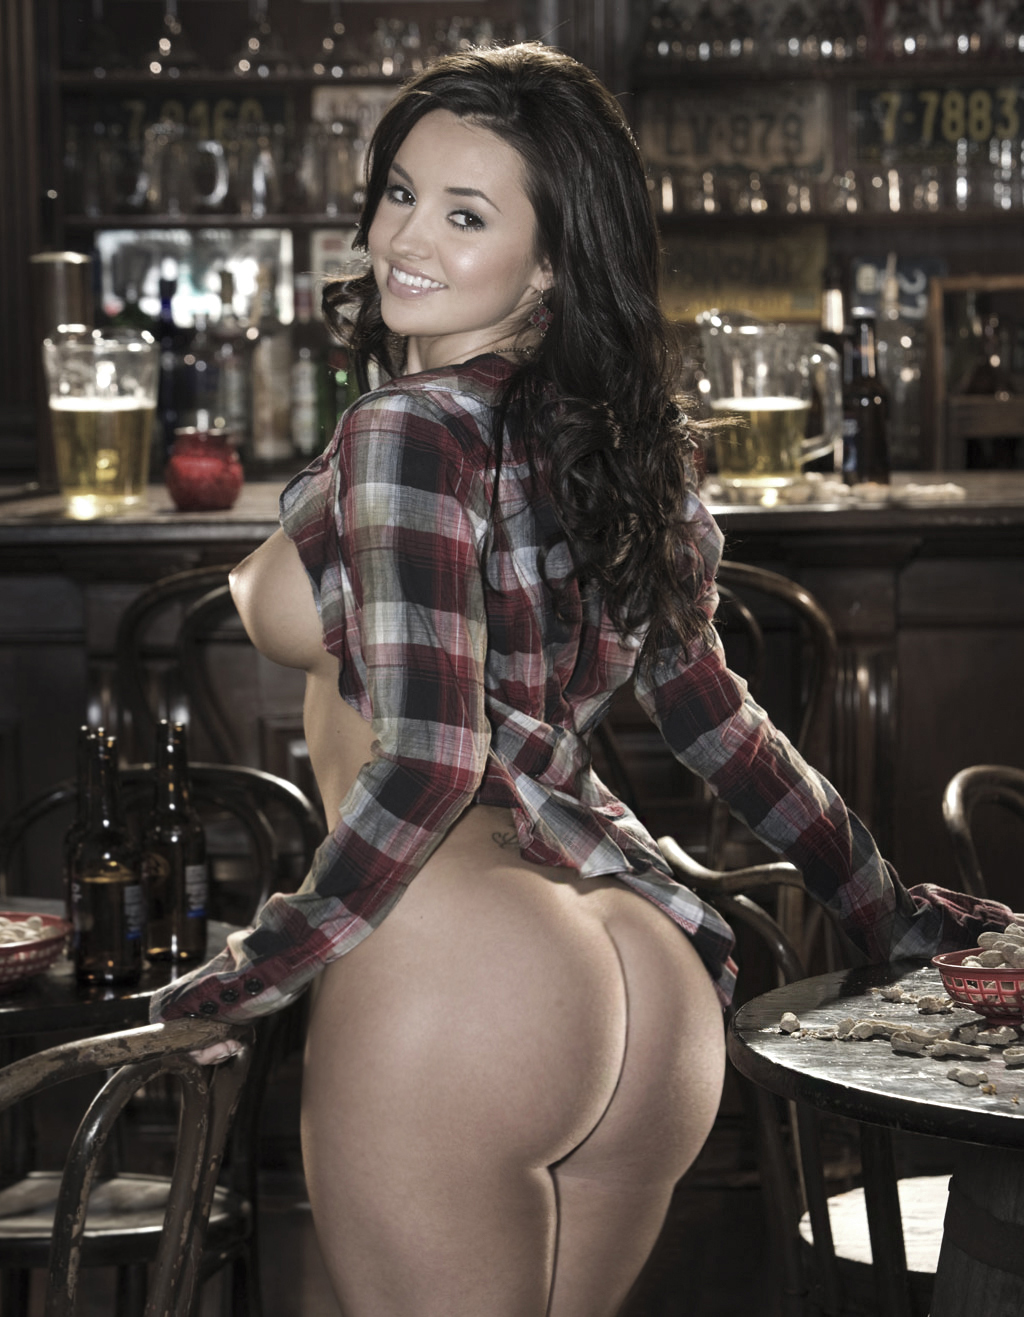 nude sexy barmaids Hot